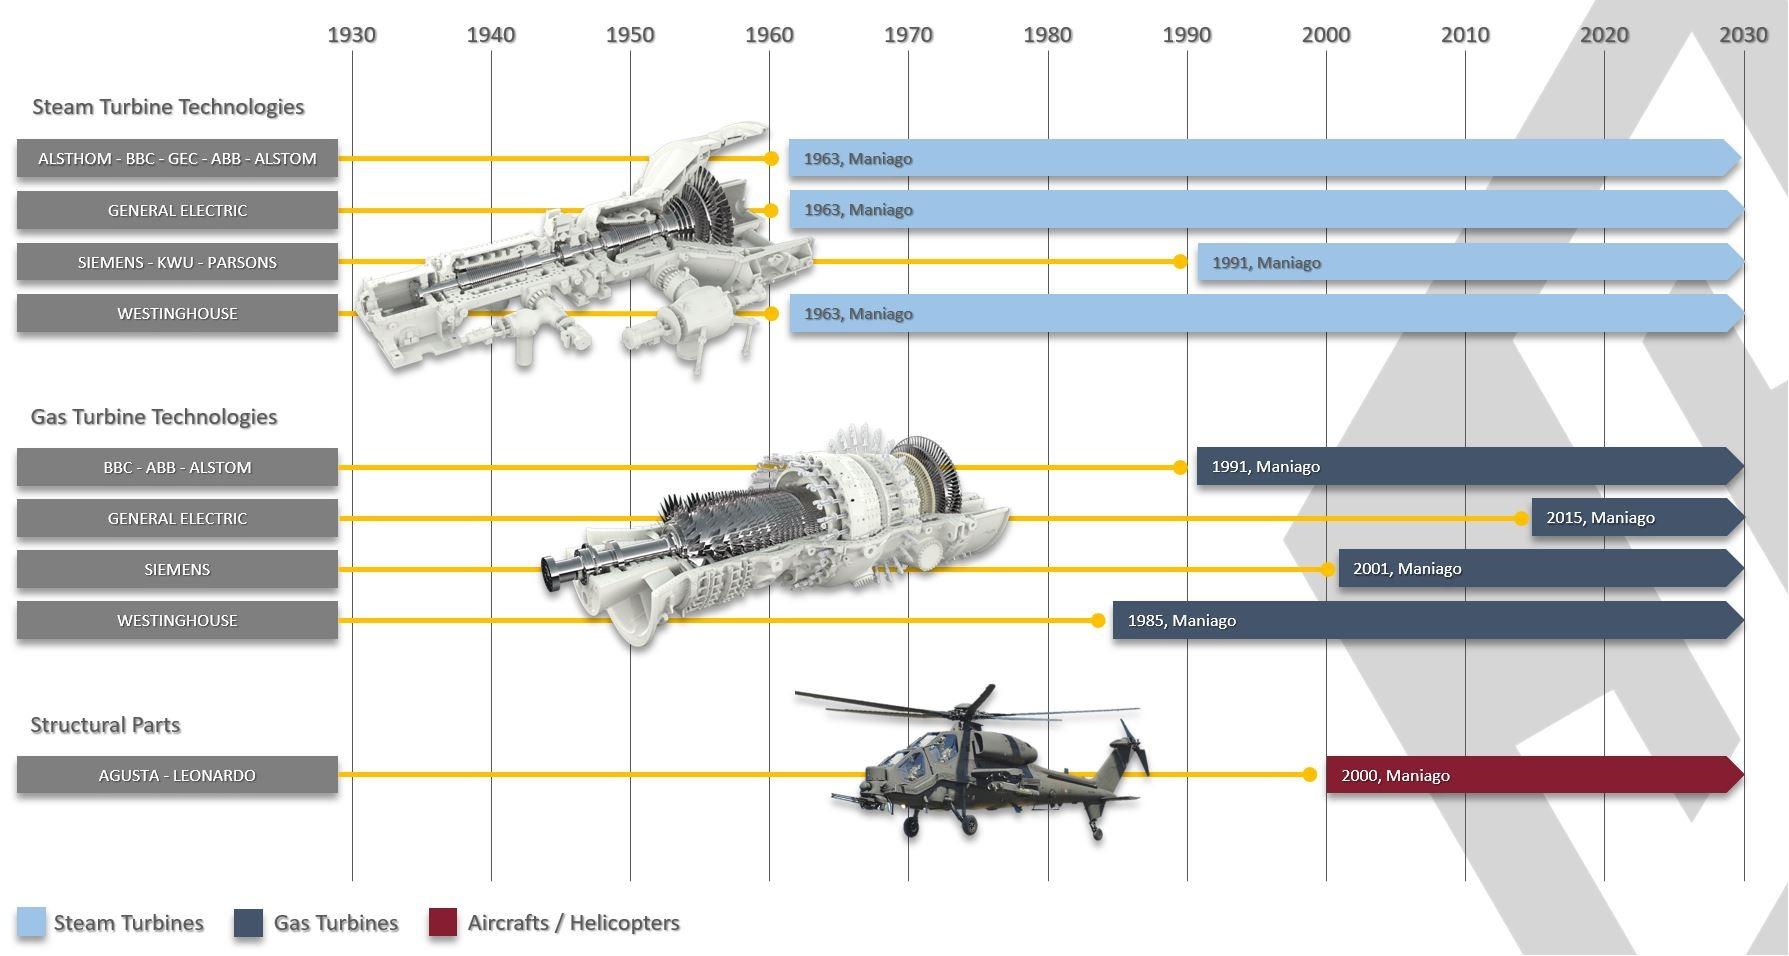 SIFCO Industires, Maniago Lifeline Energy and Aerospace